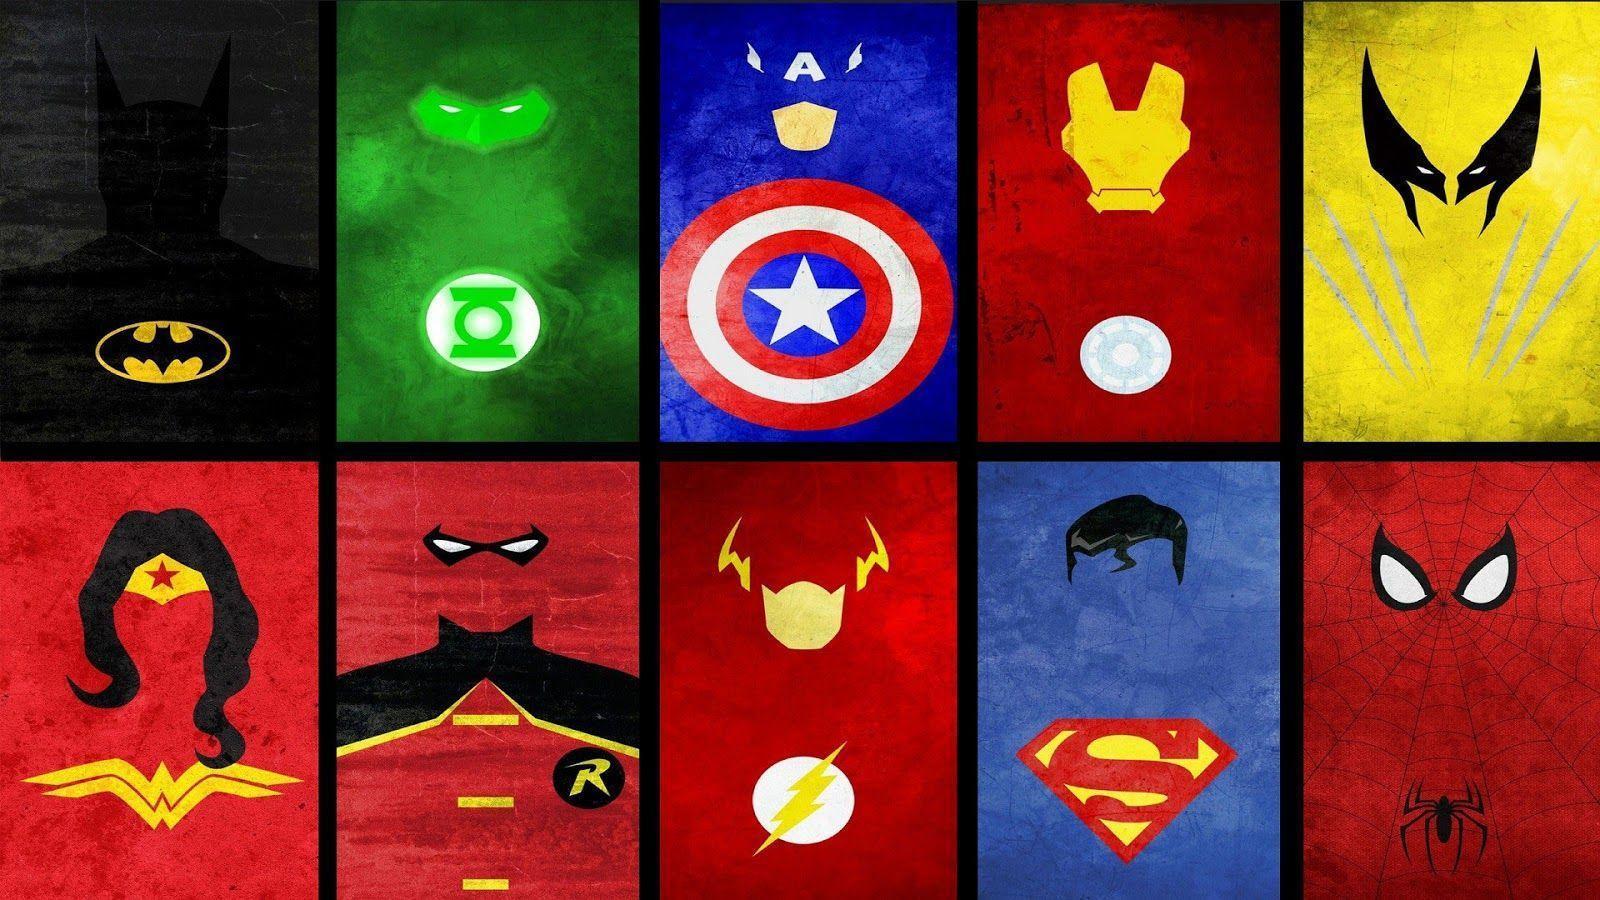 Hd wallpaper superhero - Superhero Logos Wallpaper Images Pictures Becuo